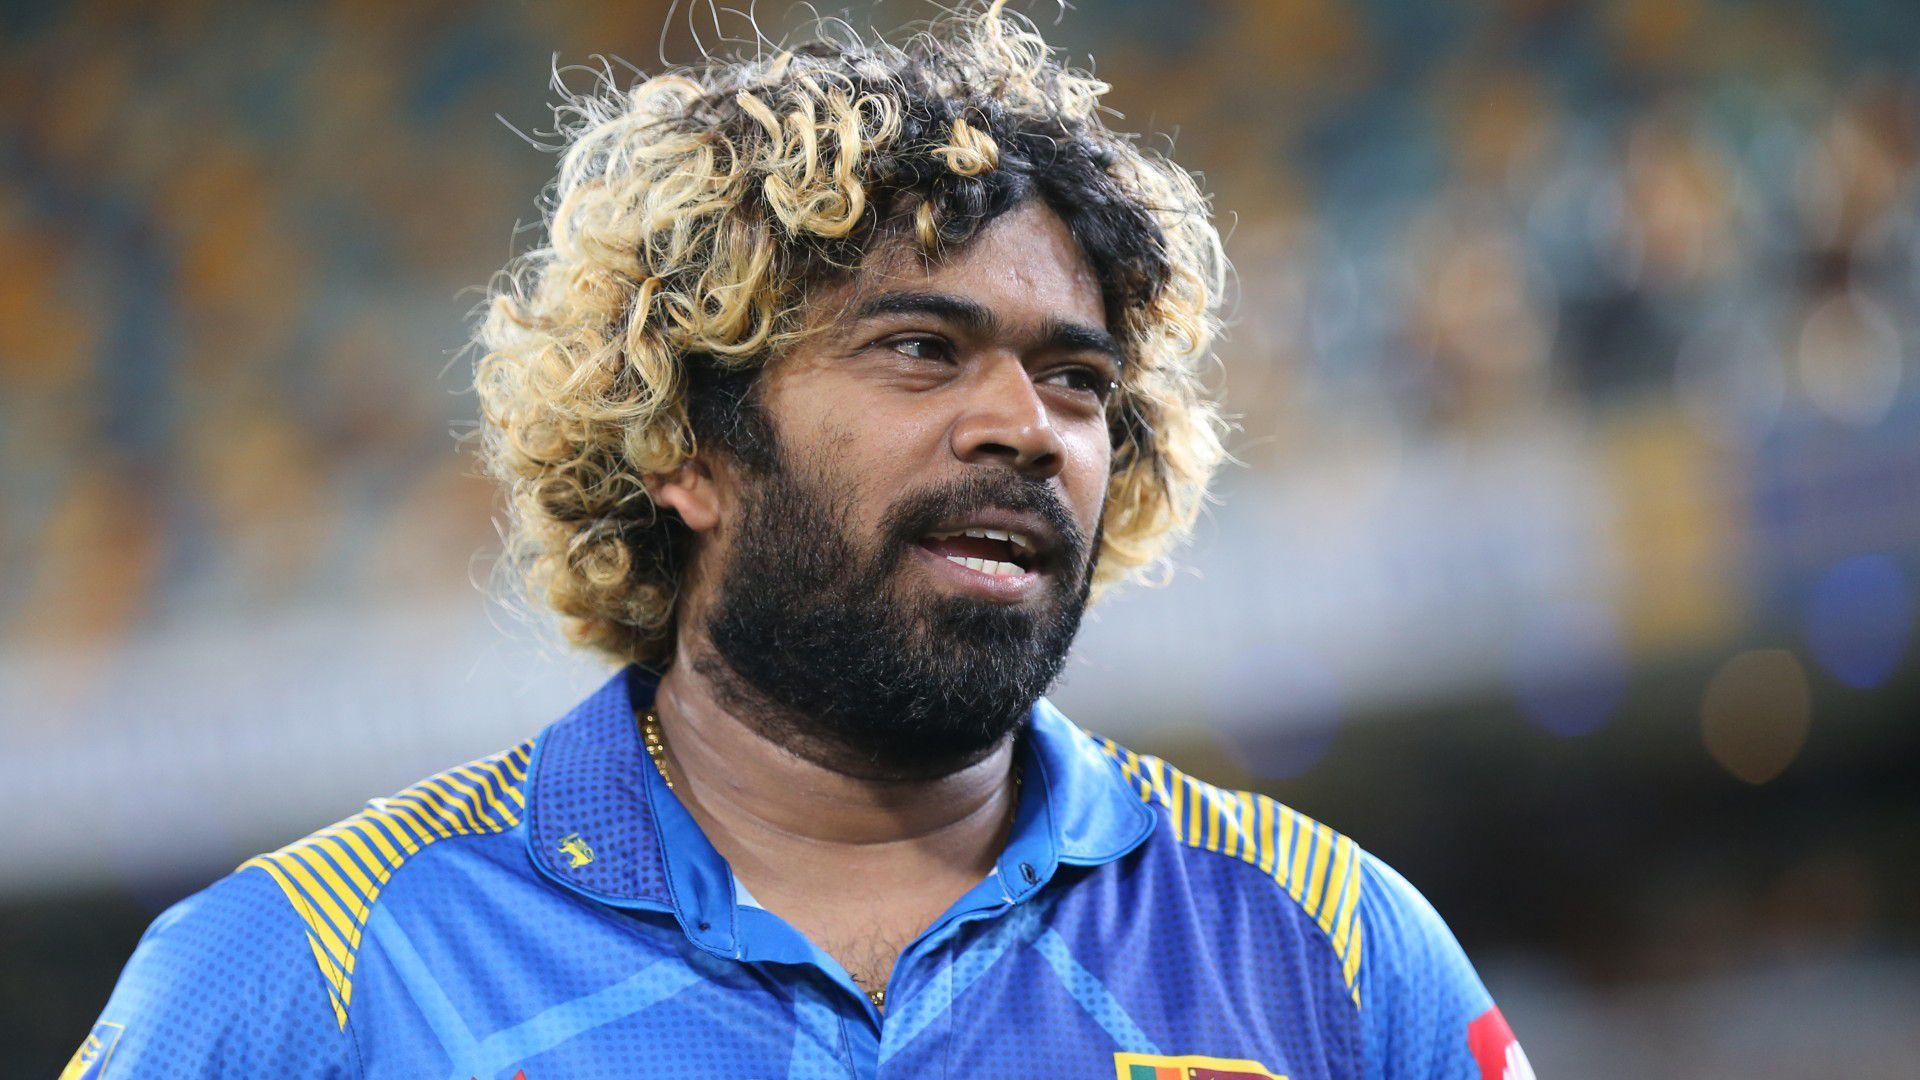 Sri Lanka paceman Lasith Malinga retires from all cricket